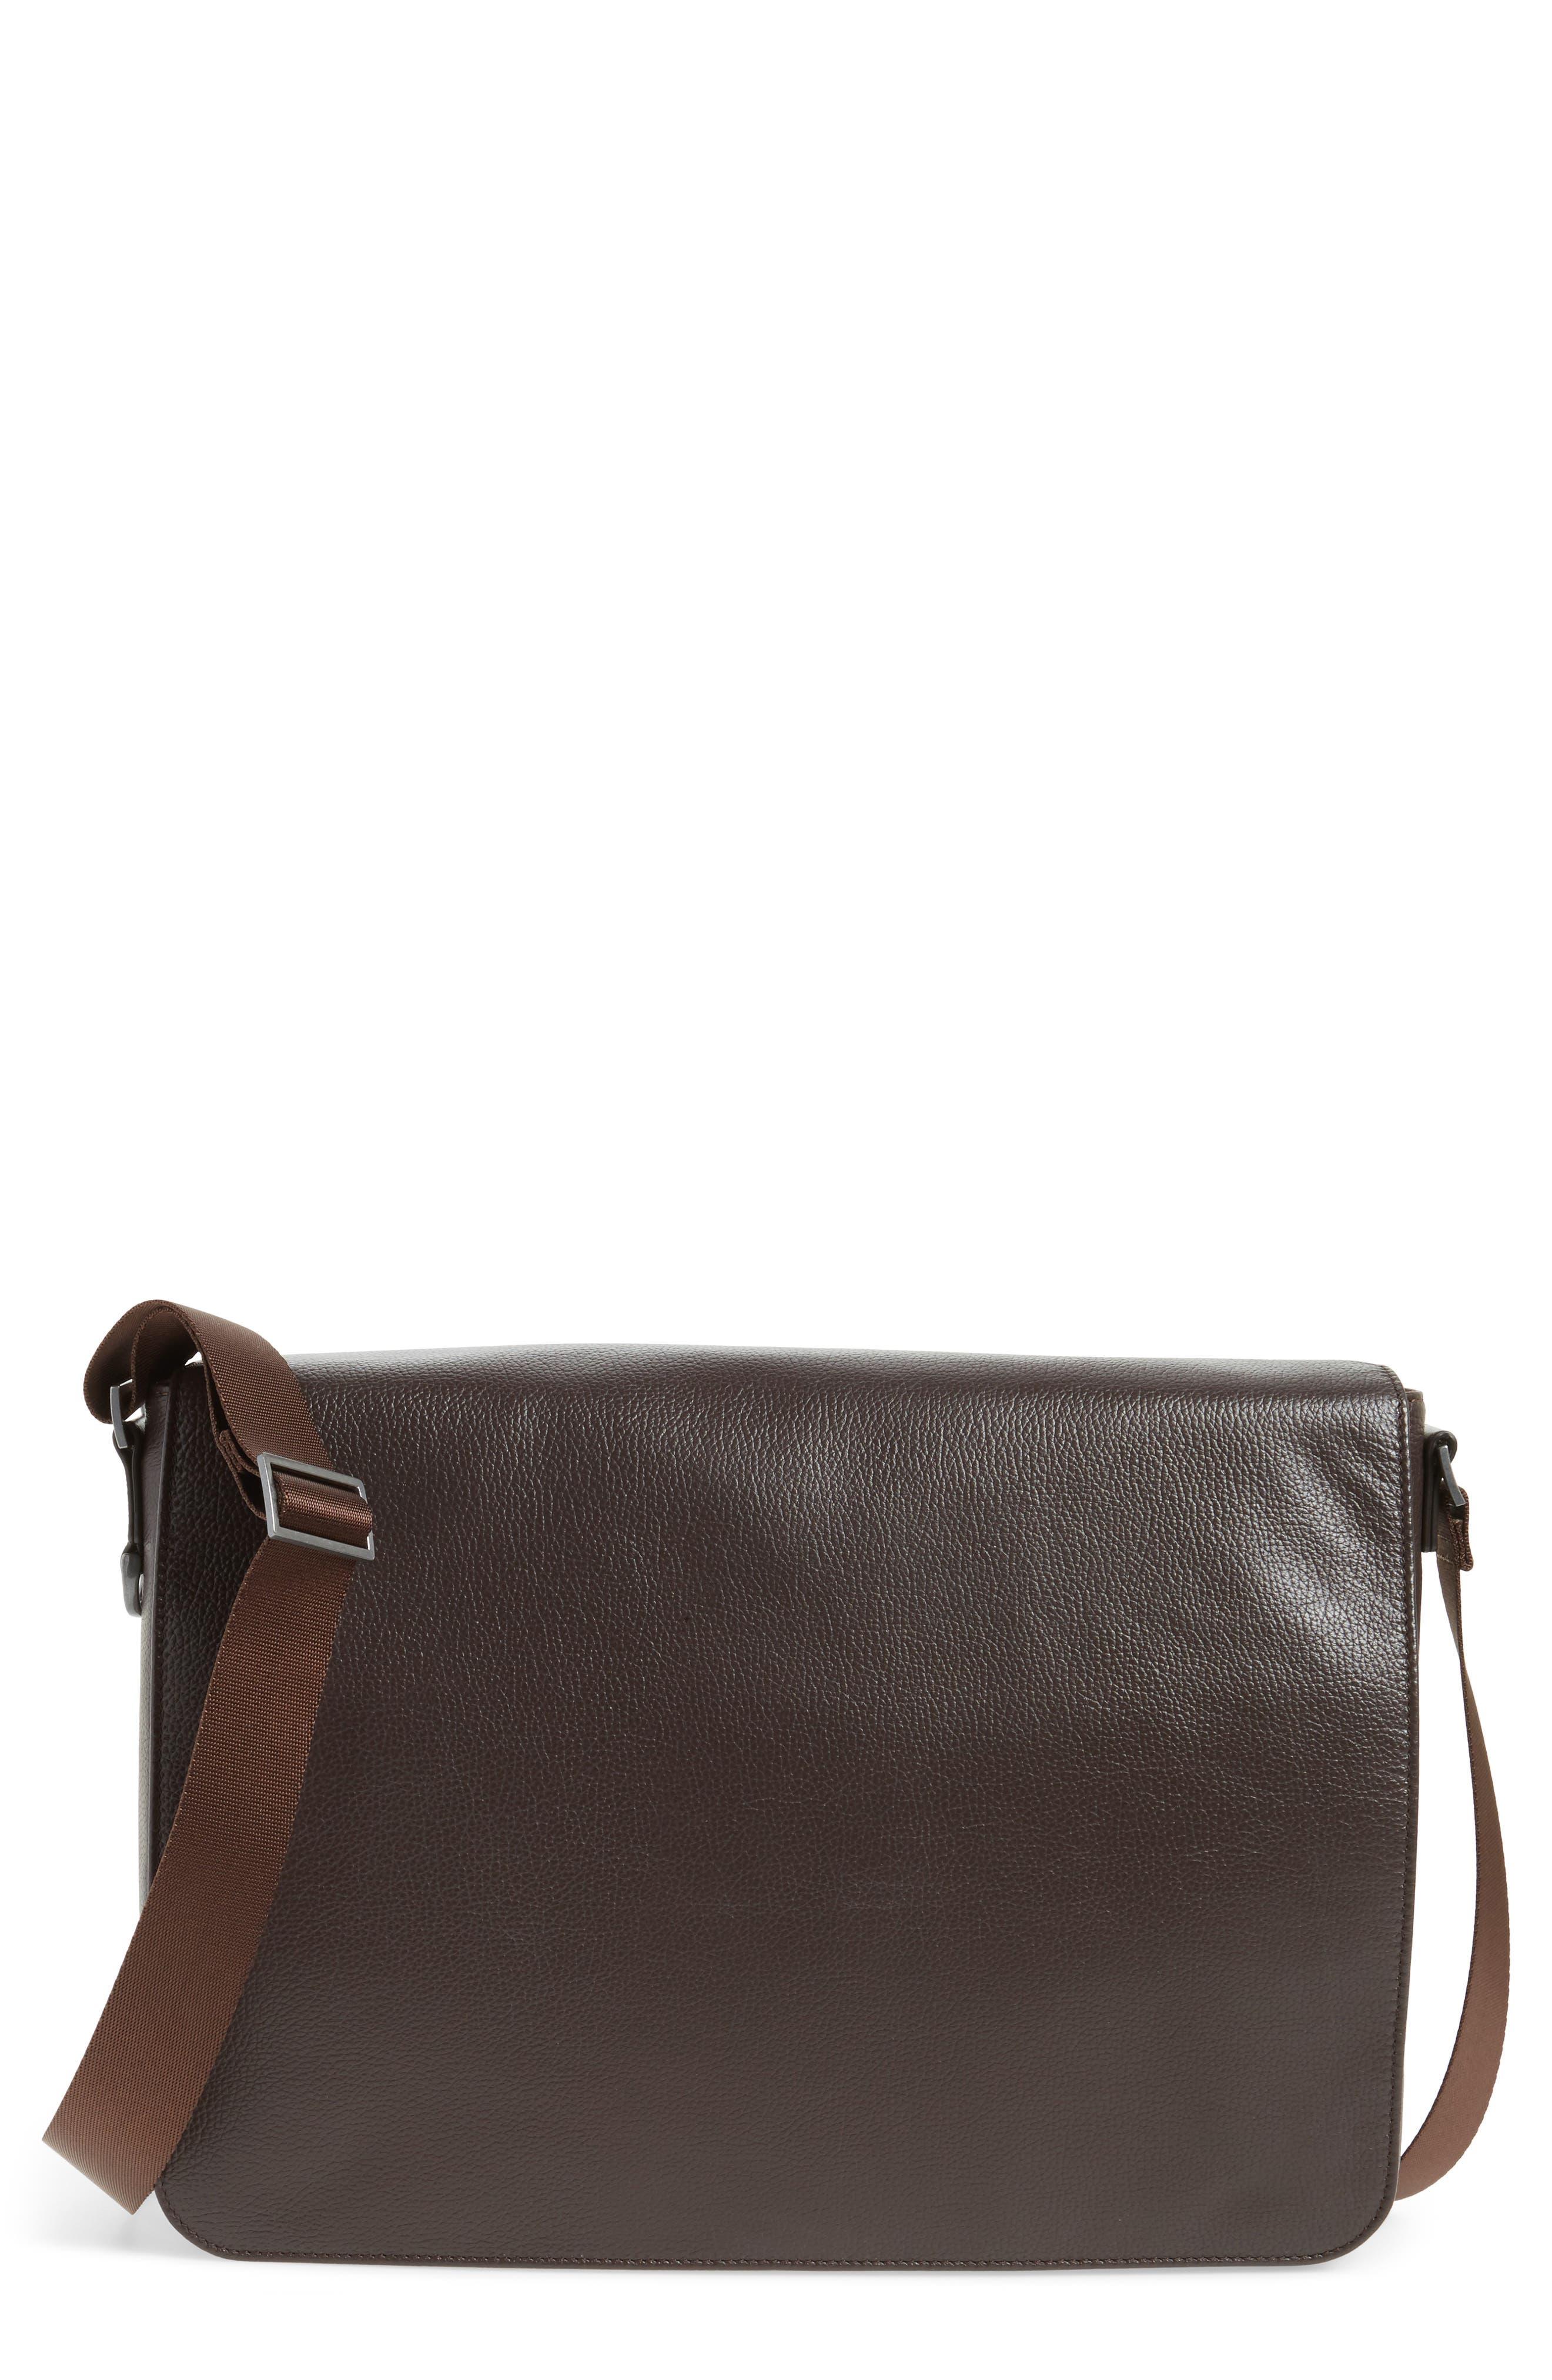 Midland Leather Messenger Bag,                         Main,                         color, BROWN